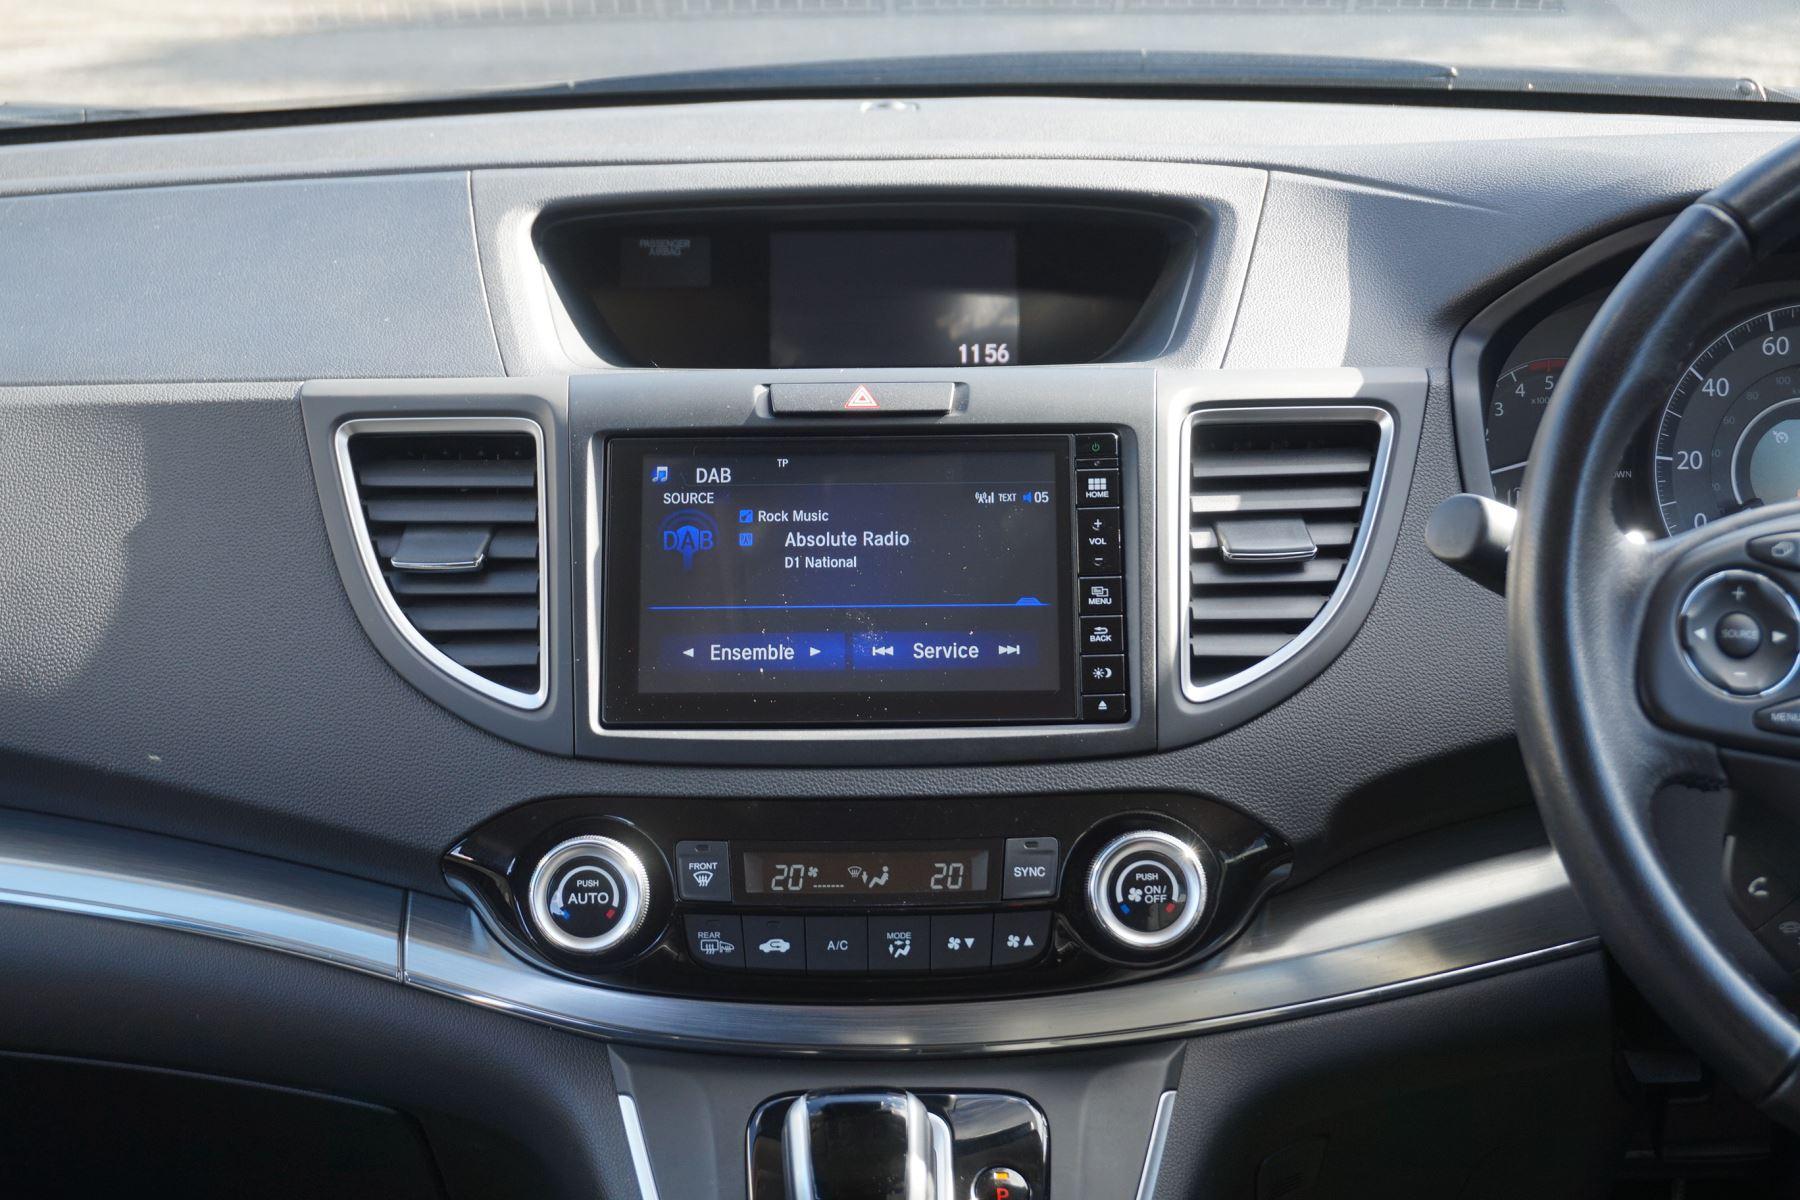 Honda CR-V 1.6 i-DTEC 160 SE Plus 5dr [Nav] 4WD image 11